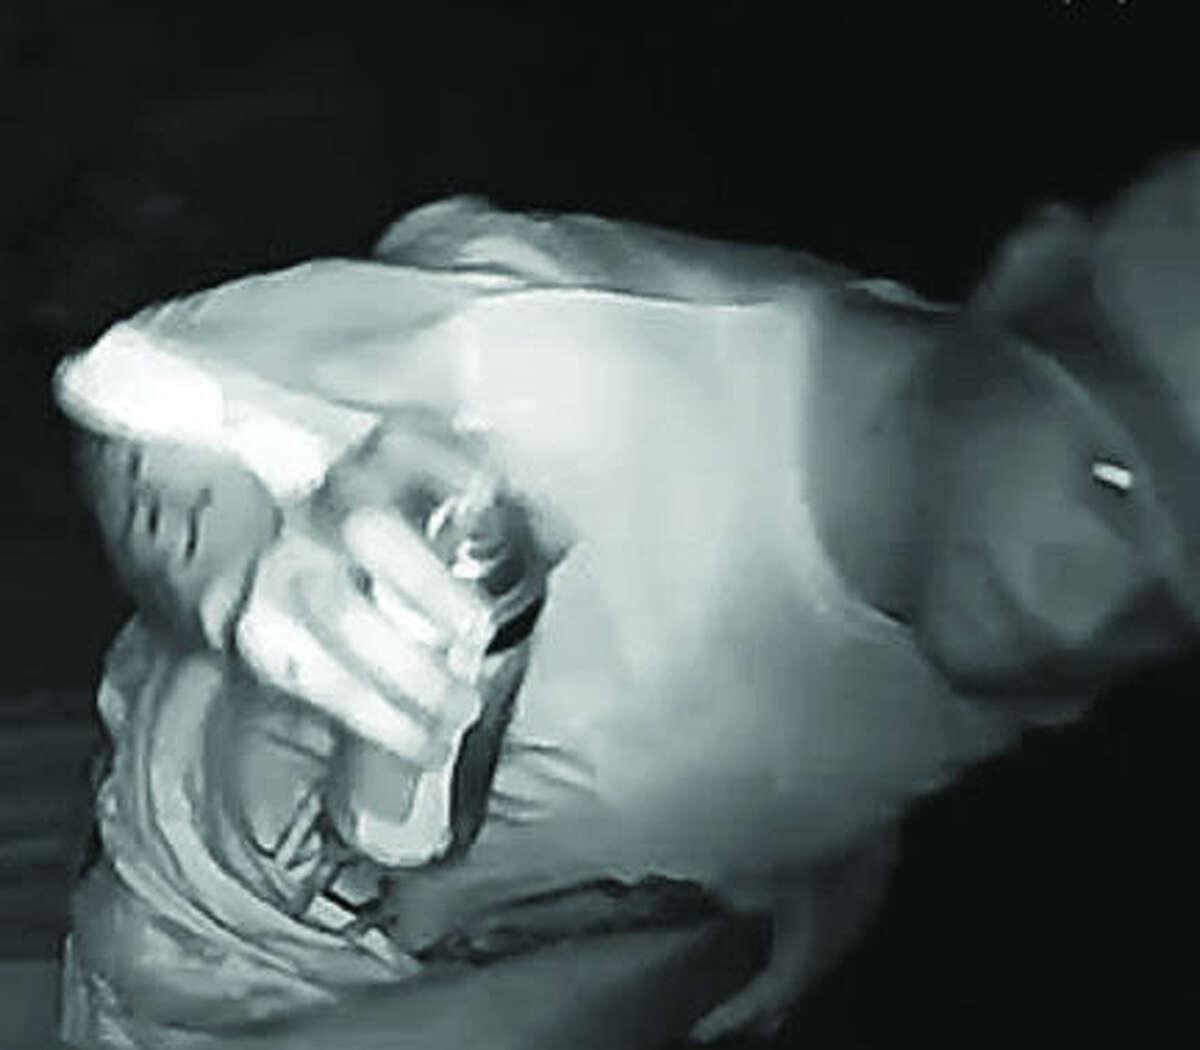 Wilton police seek public's help identifying burglary suspect